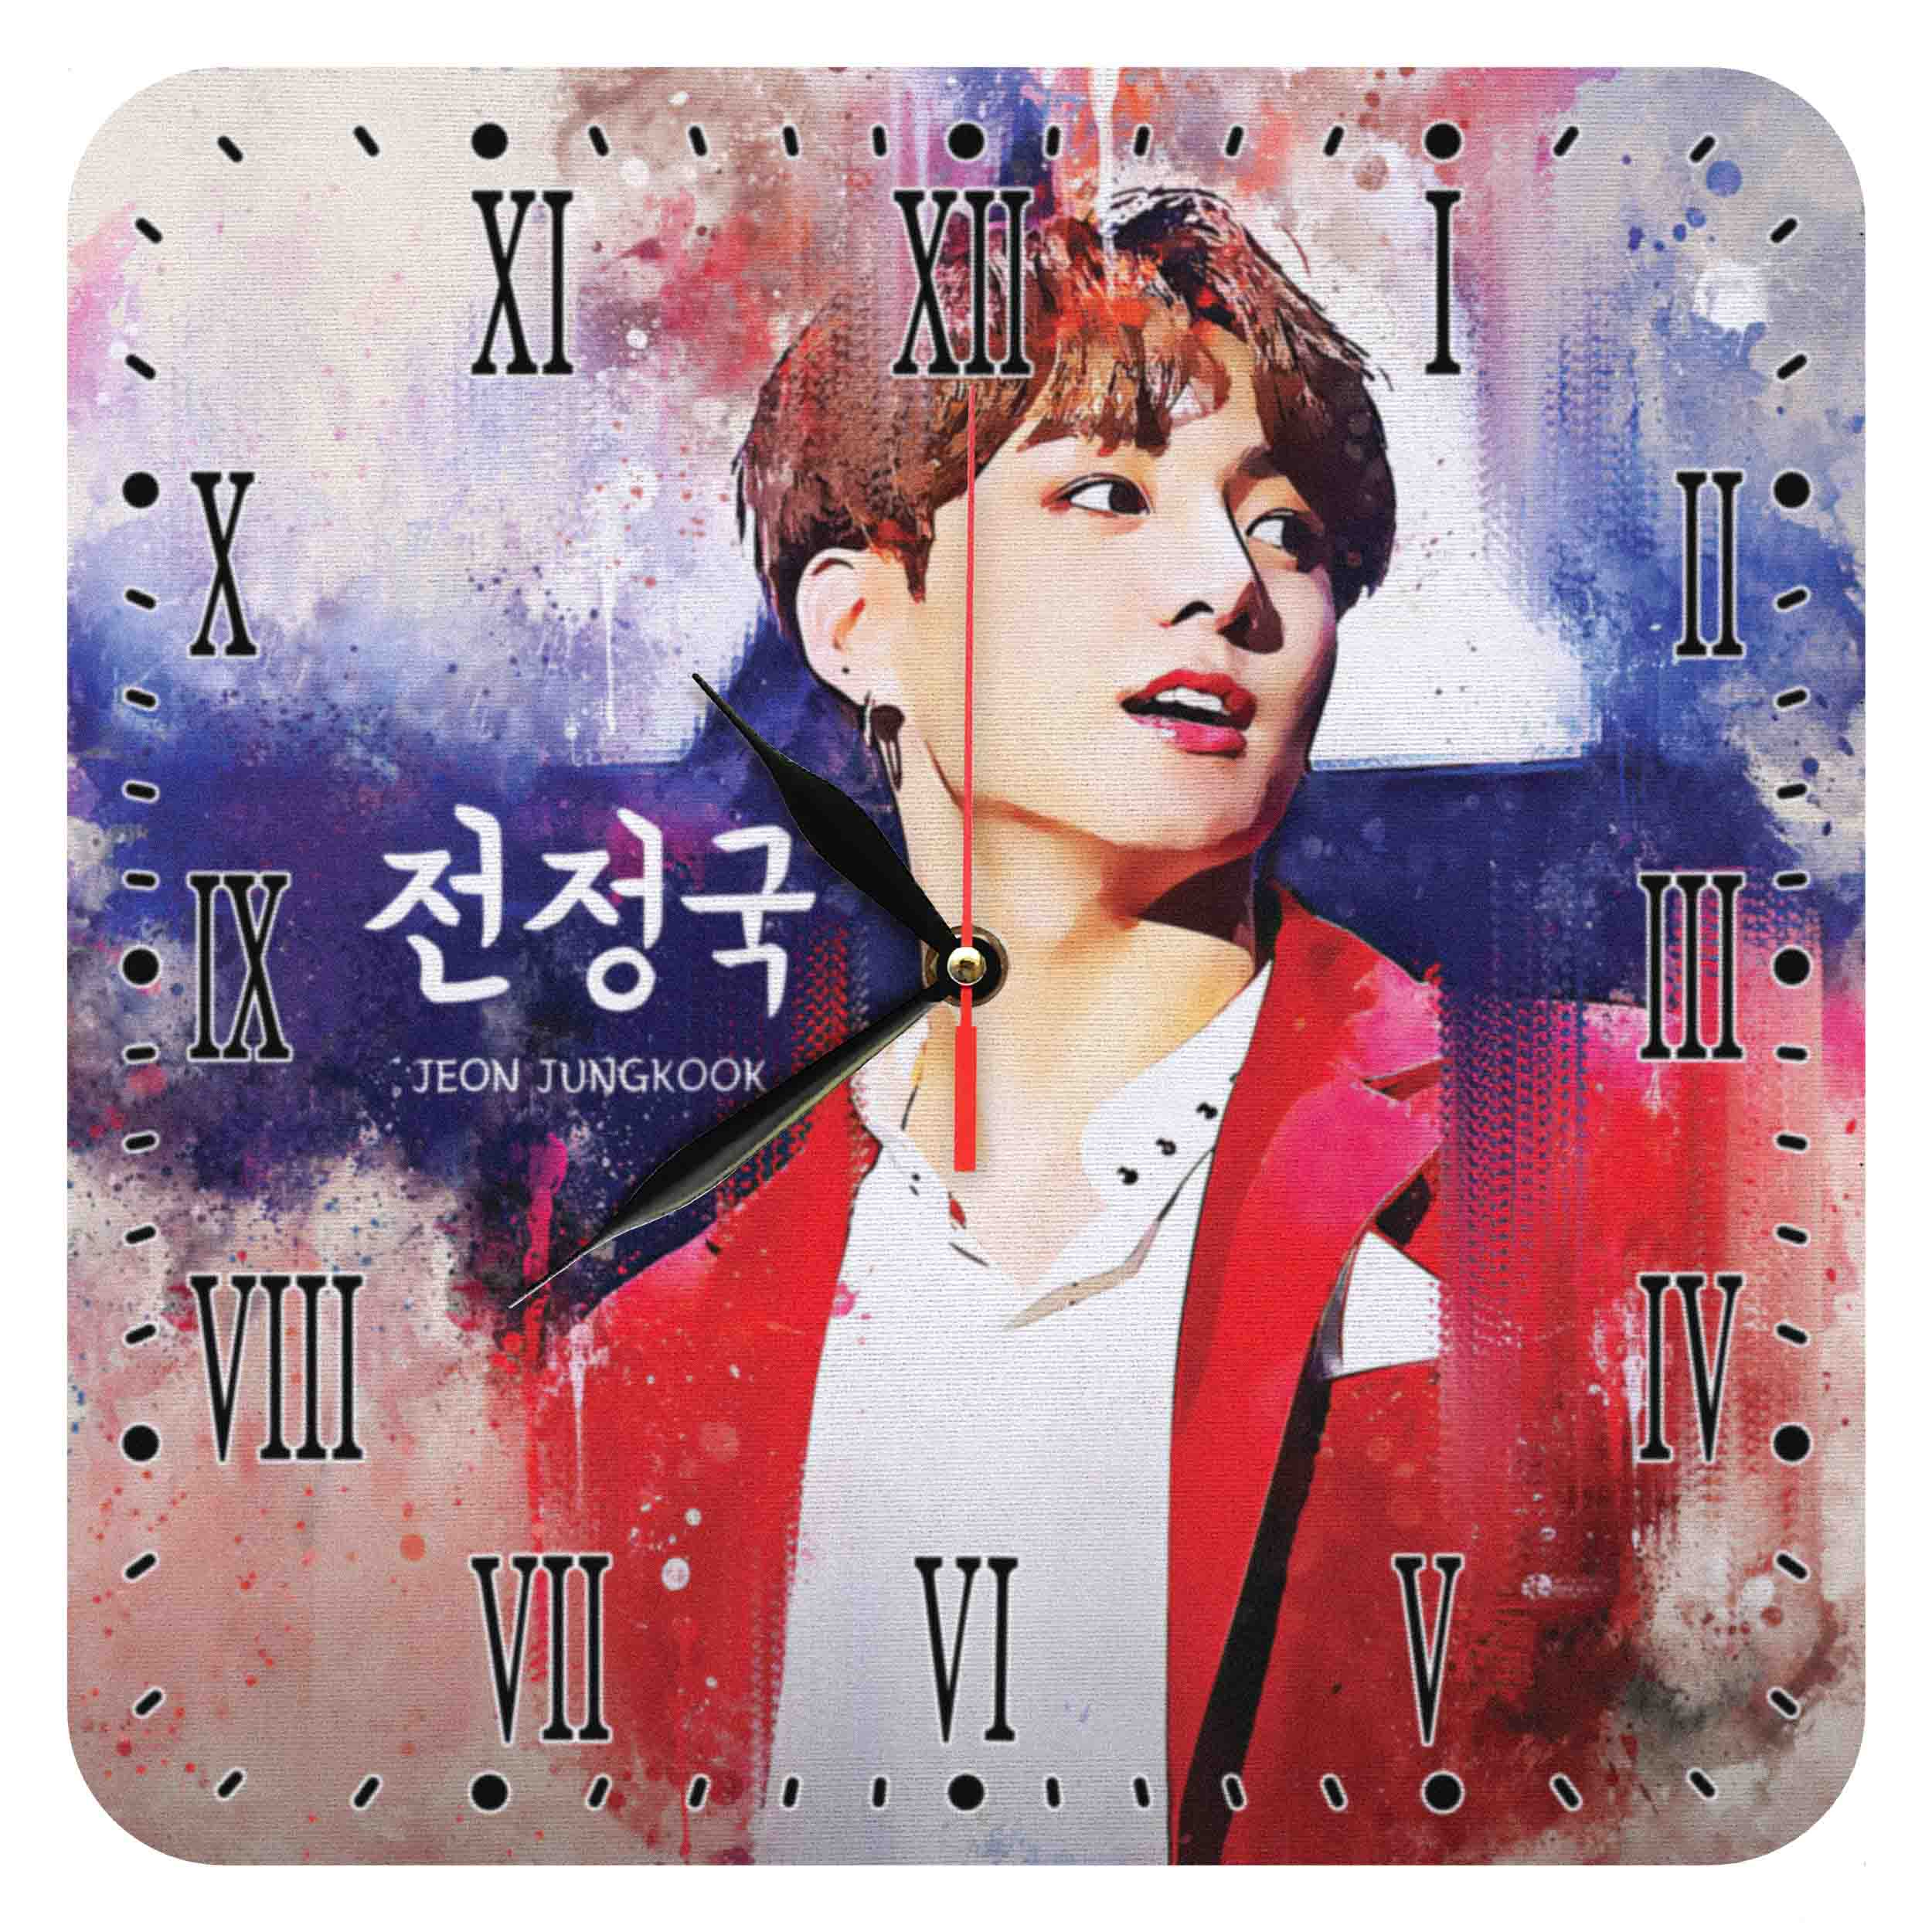 ساعت دیواری مدل BTS Jeon Jungkook